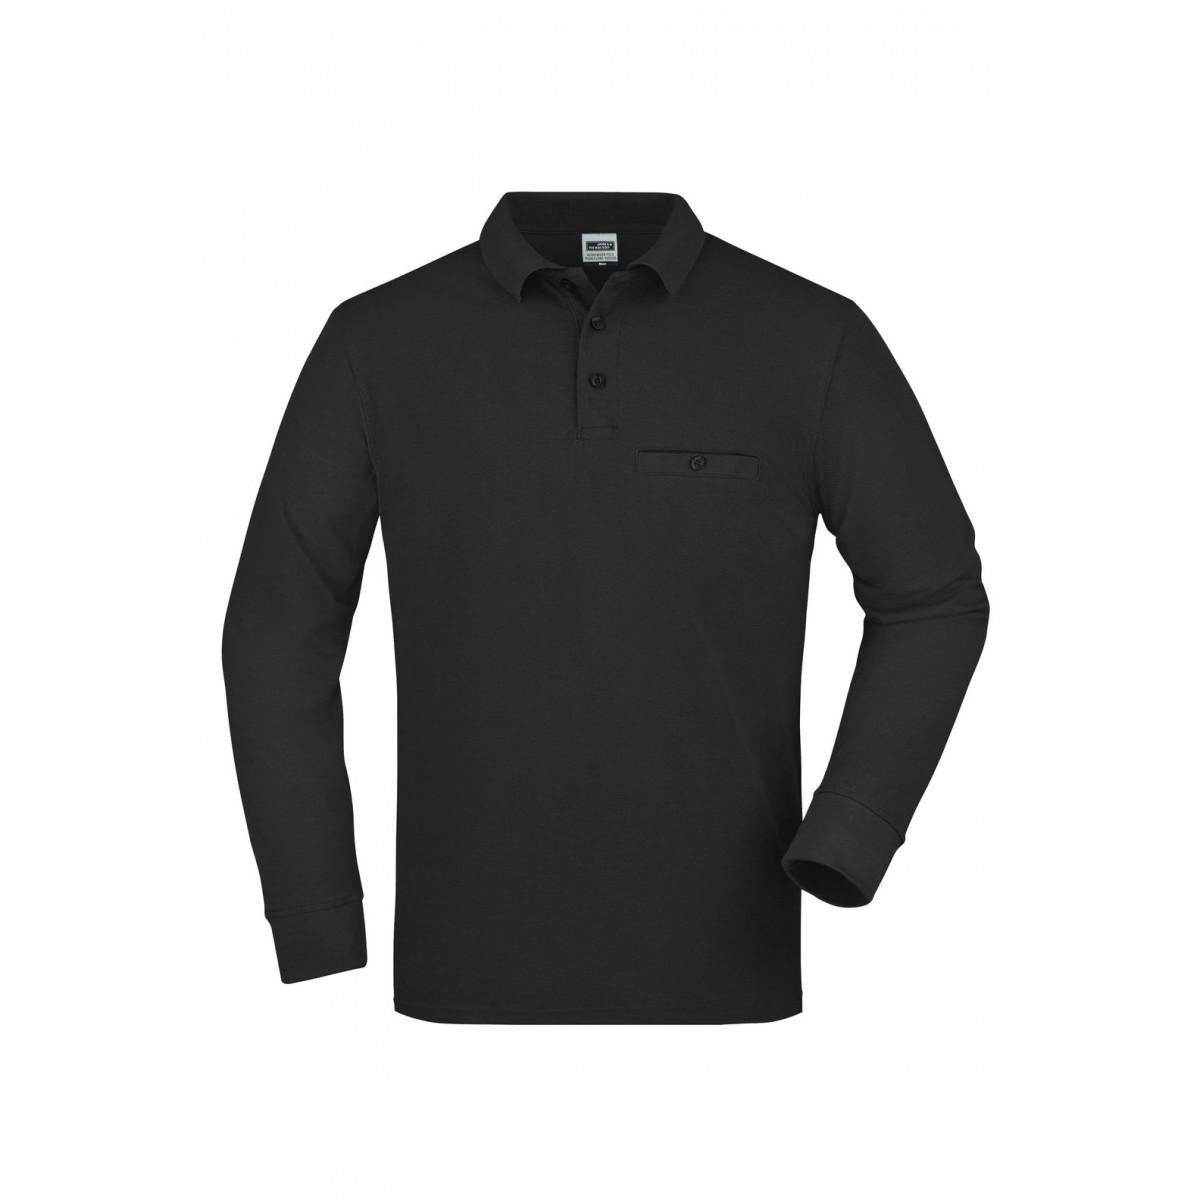 Рубашка поло мужская JN866 Mens Workwear Polo Pocket Longsleeve - Черный